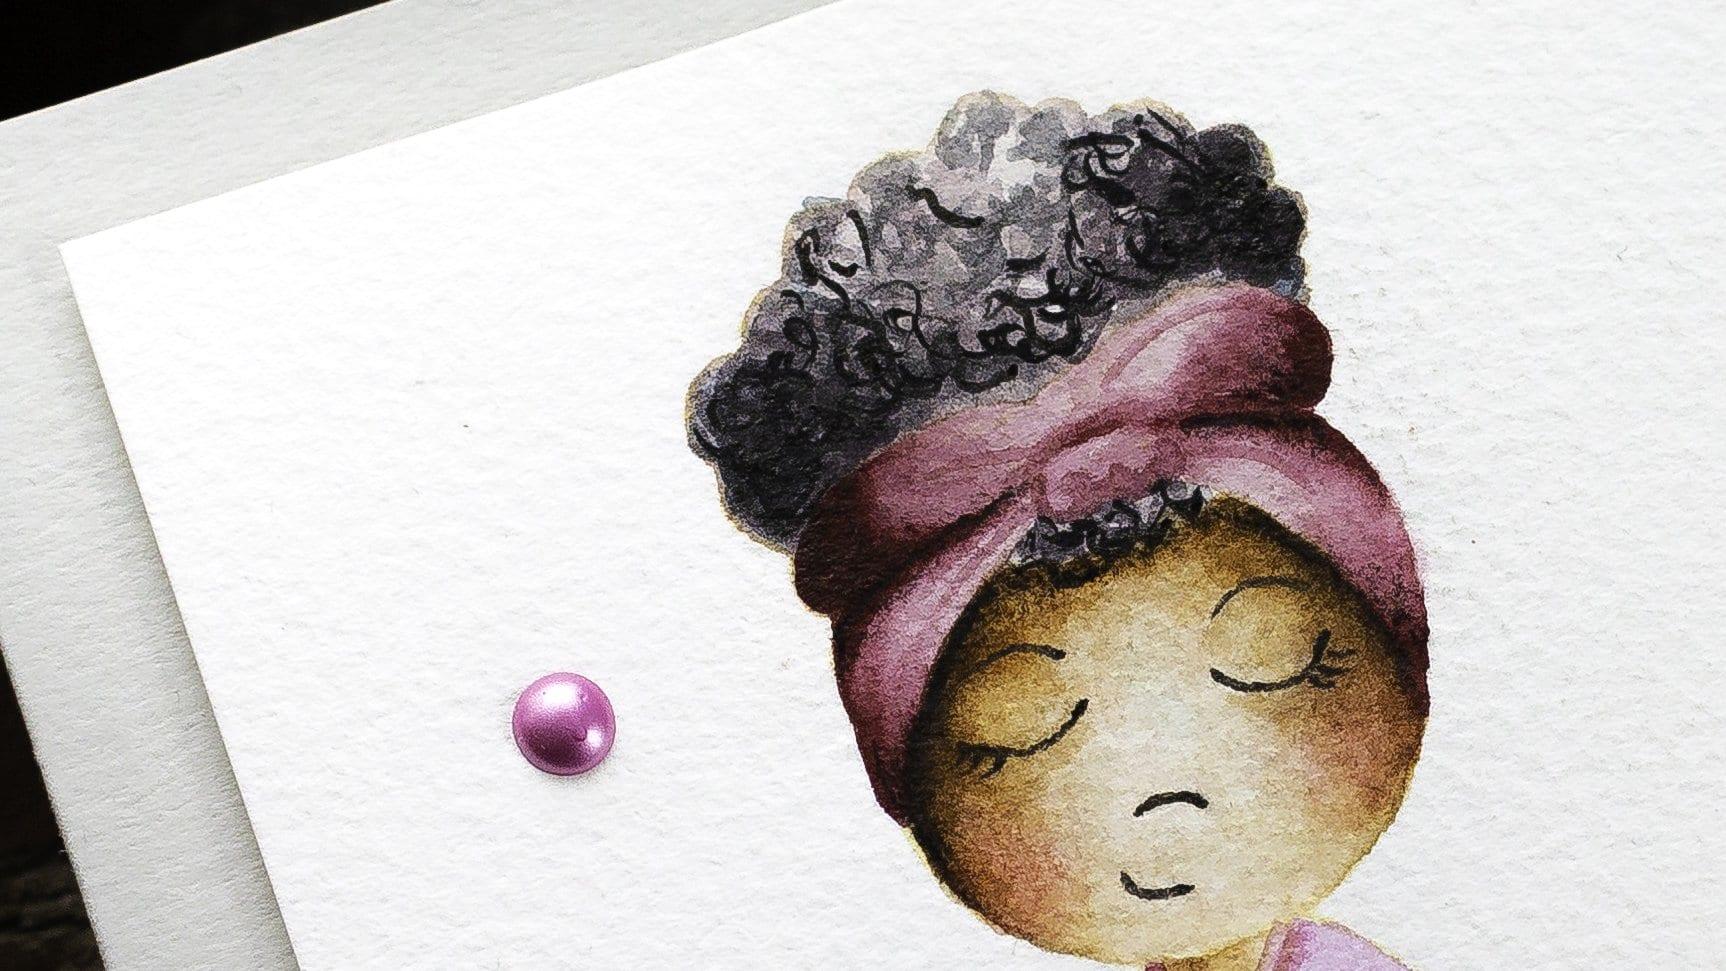 Sneak peek - video watercolouring curly hair handmade card tutorial by Debby Hughes using supplies from Simon Says Stamp #handmadecards